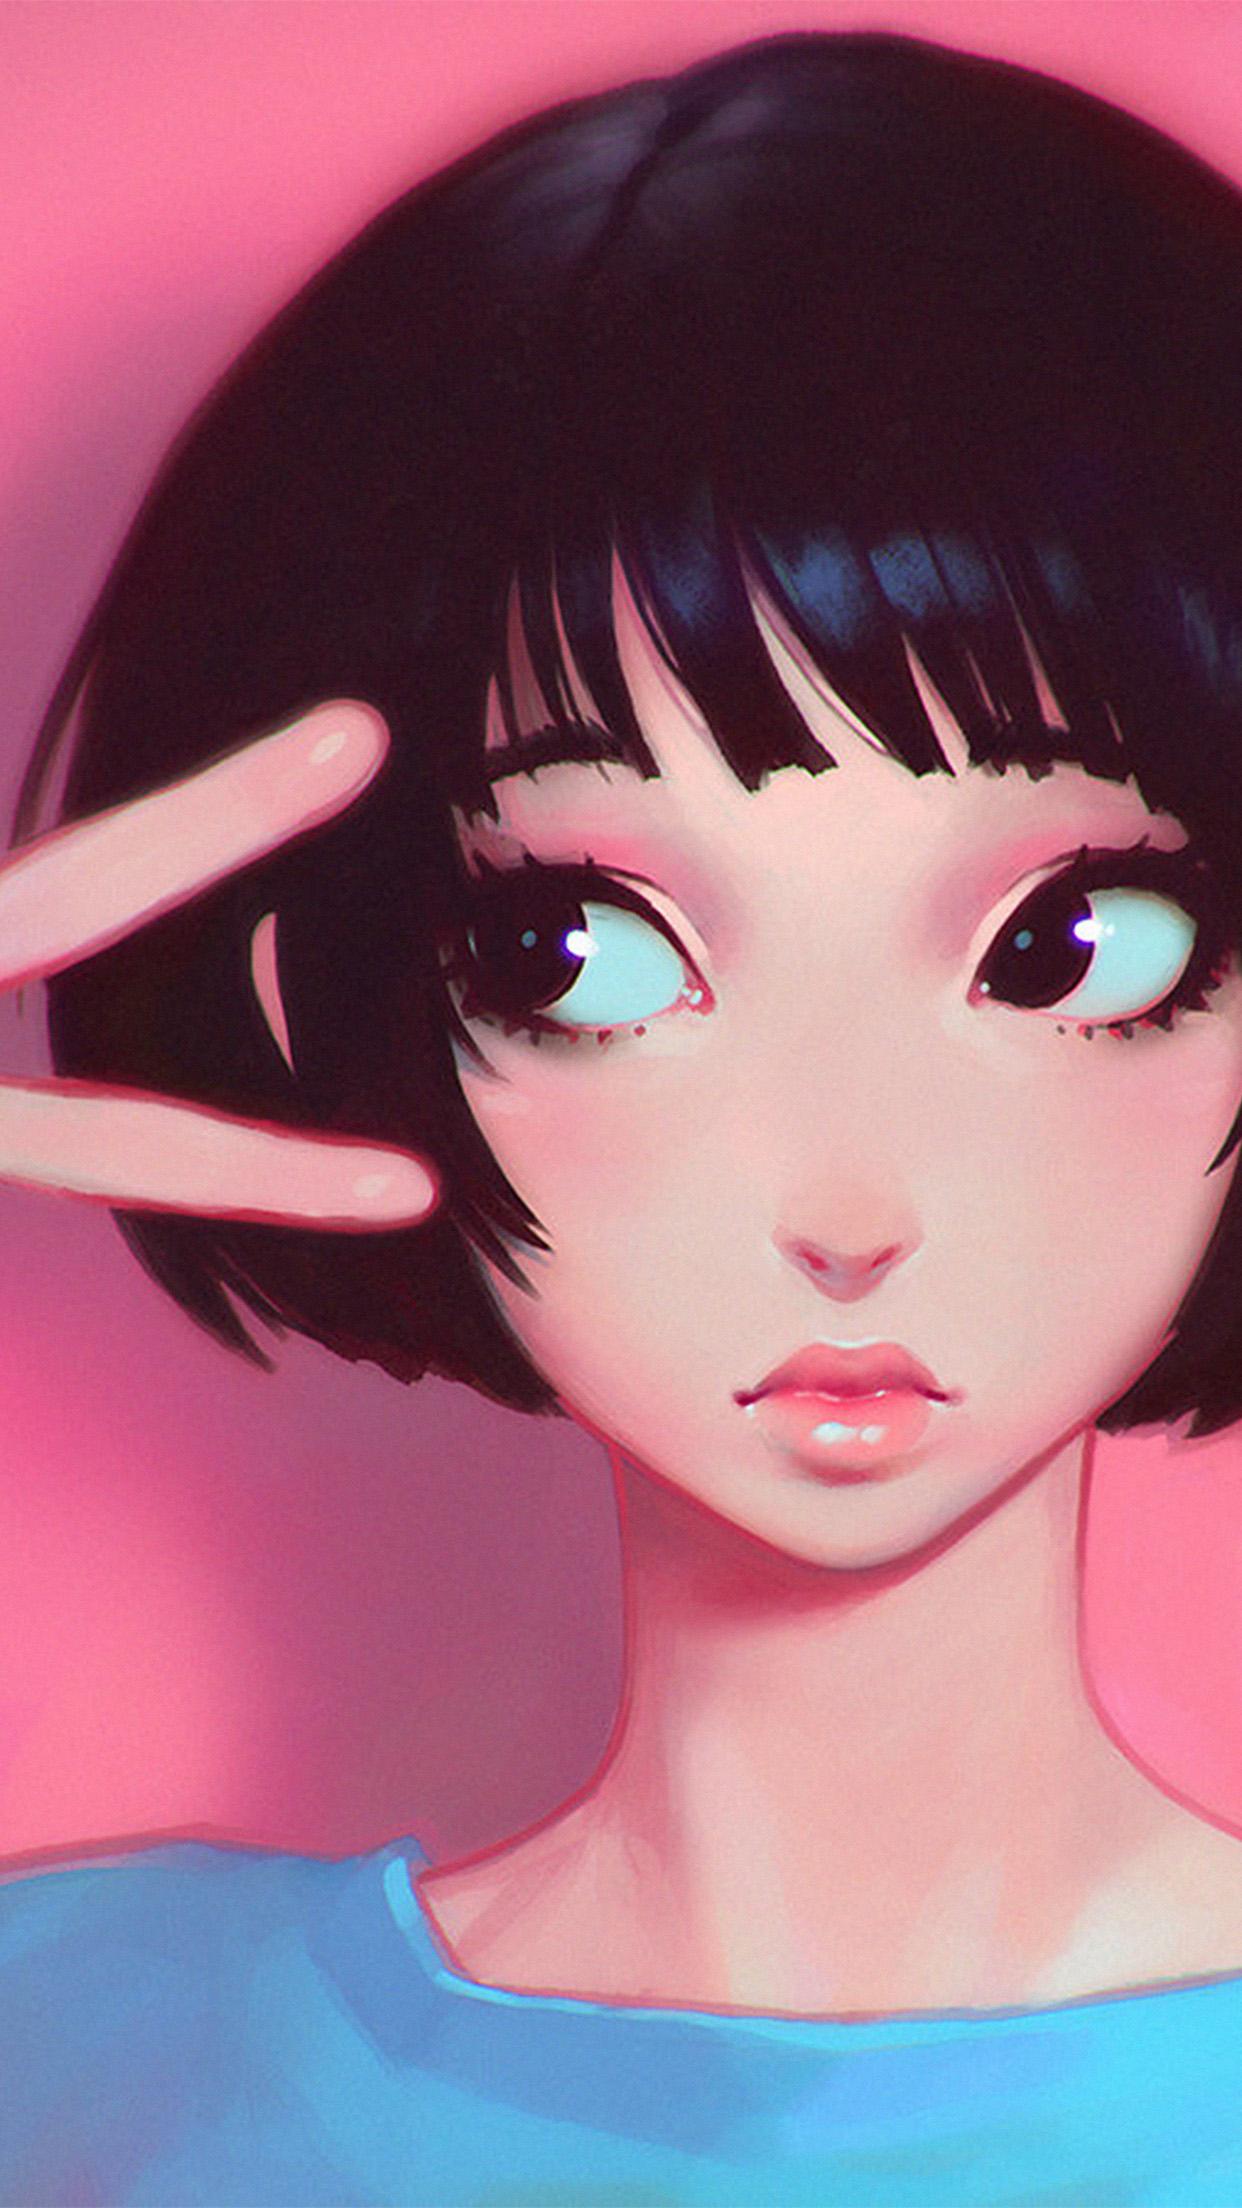 Anime Girl Wallpaper Blue Ay03 Ilya Kuvshinov Pink Girl Illustration Art Wallpaper